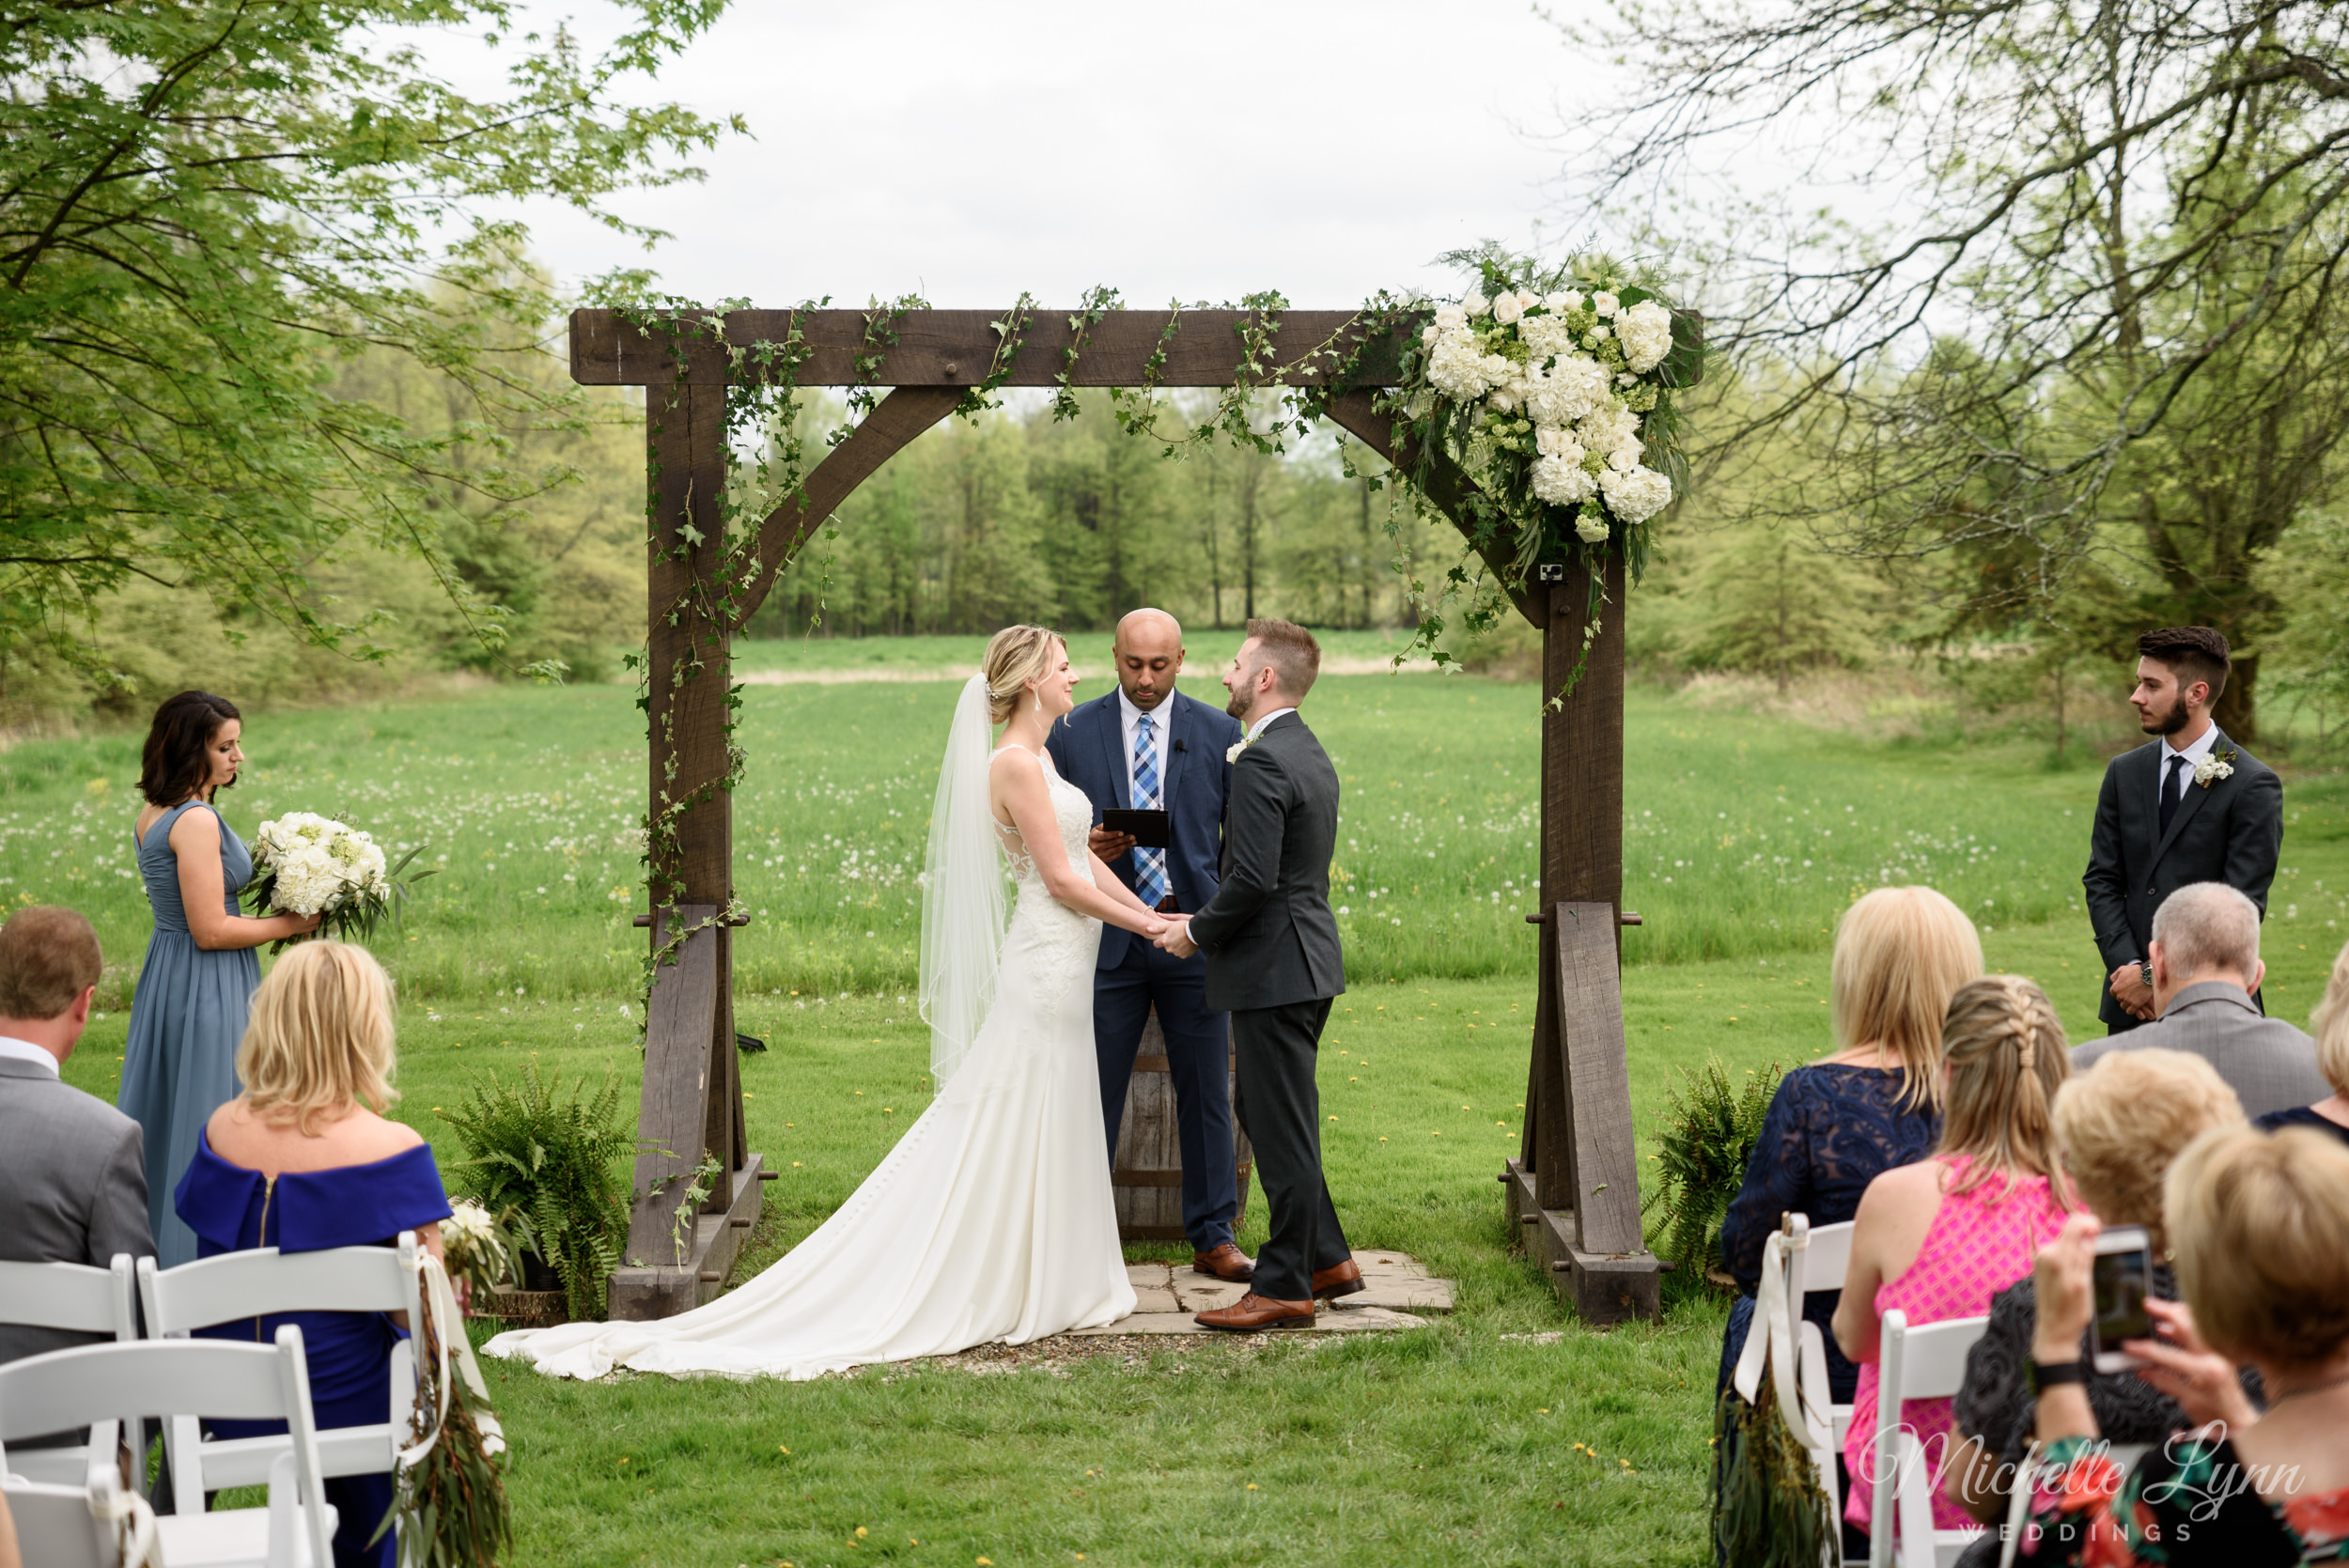 mlw-the-farm-bakery-and-events-wedding-photos-39.jpg